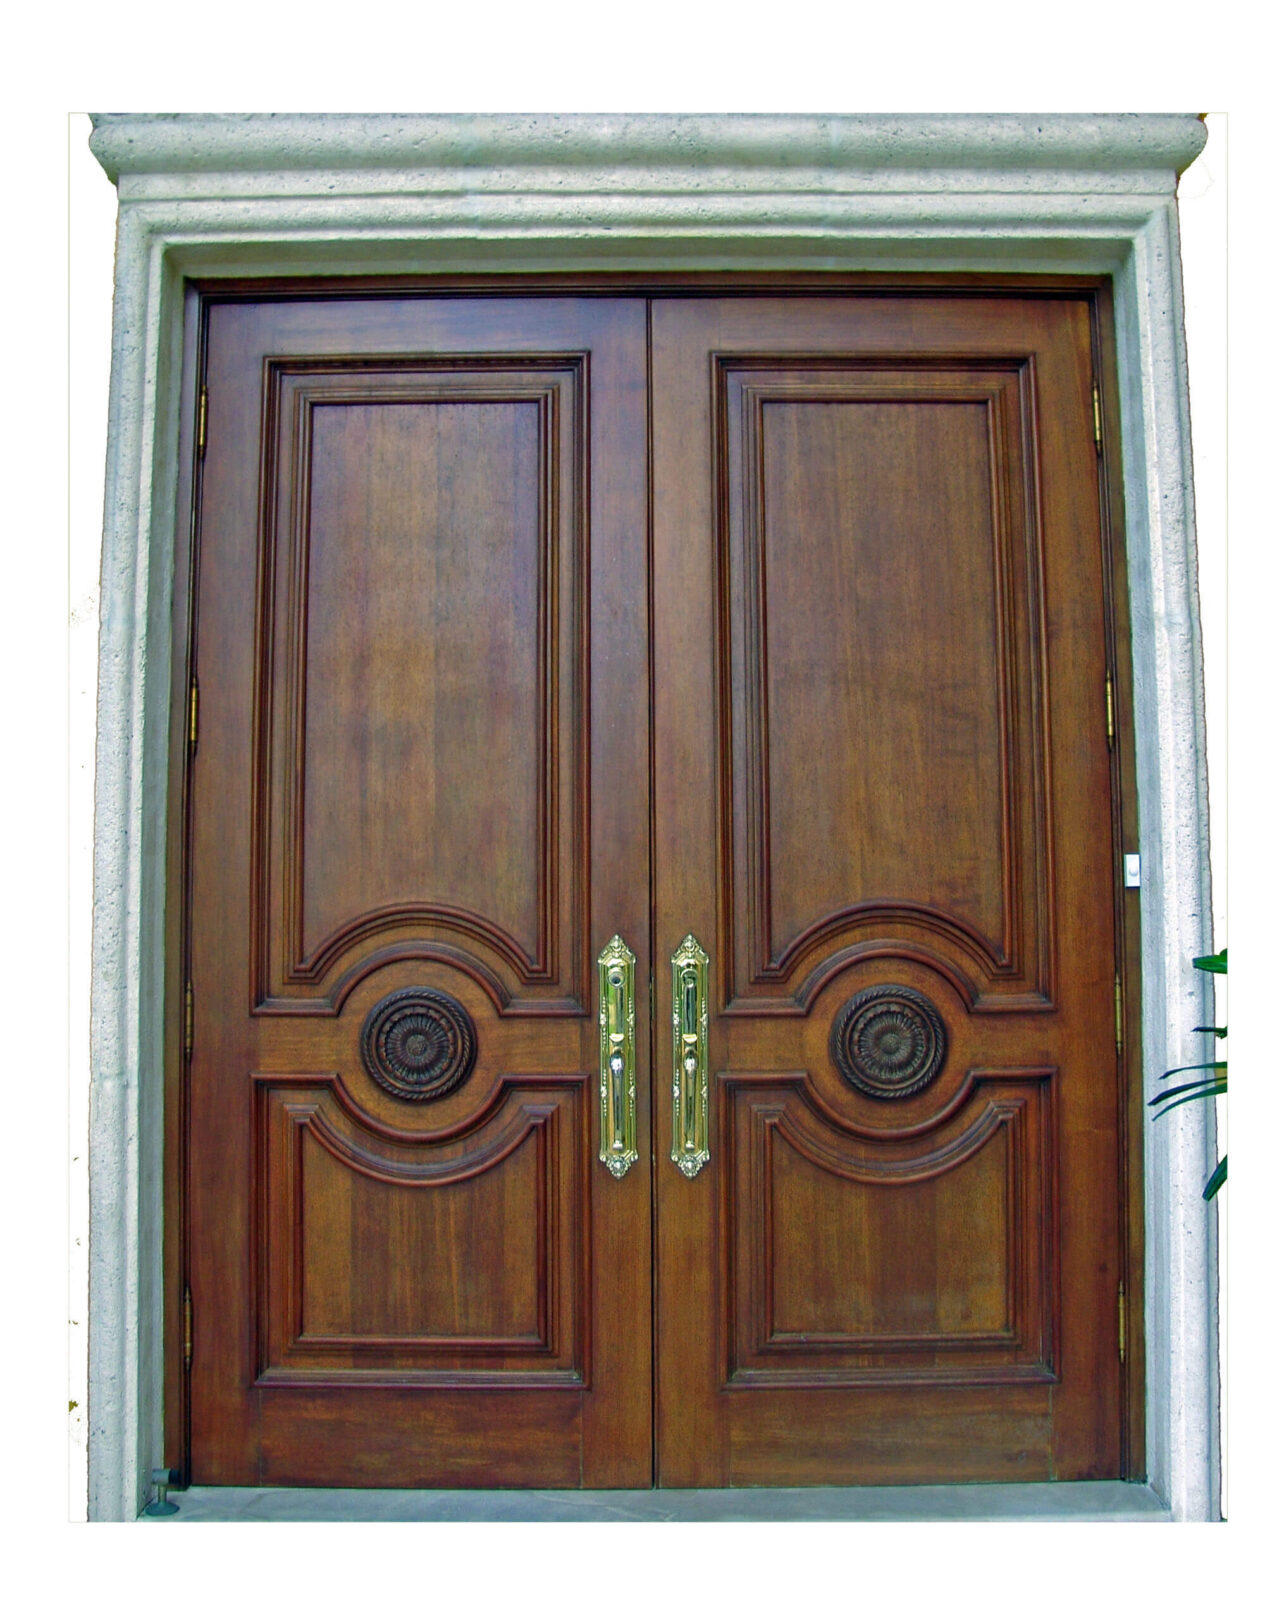 ST. AUGUSTIN MAHOGANY EXTERIOR DOOR.